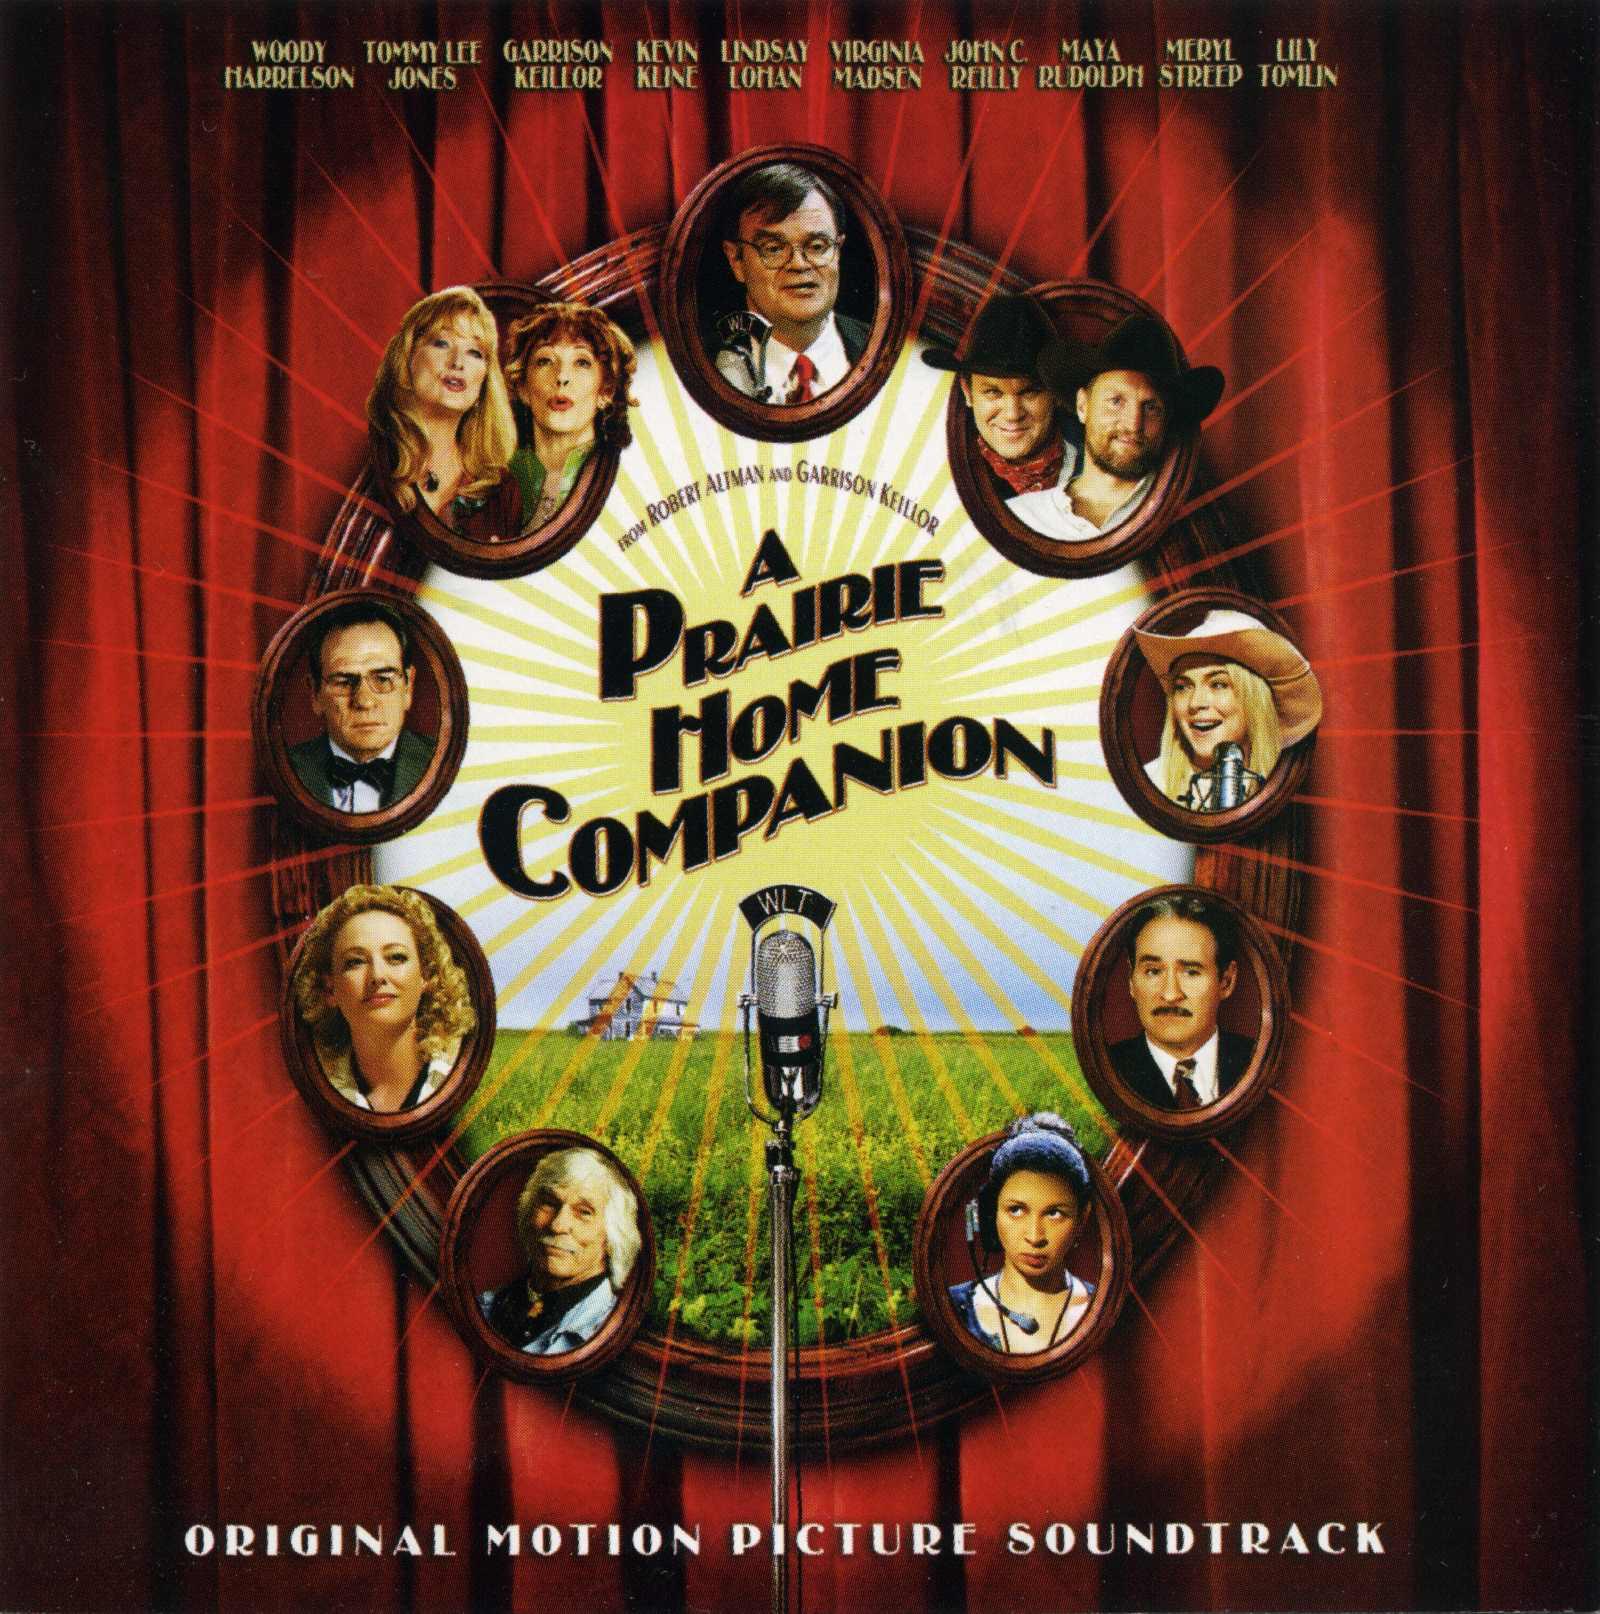 Prairie Home panion Sound Track